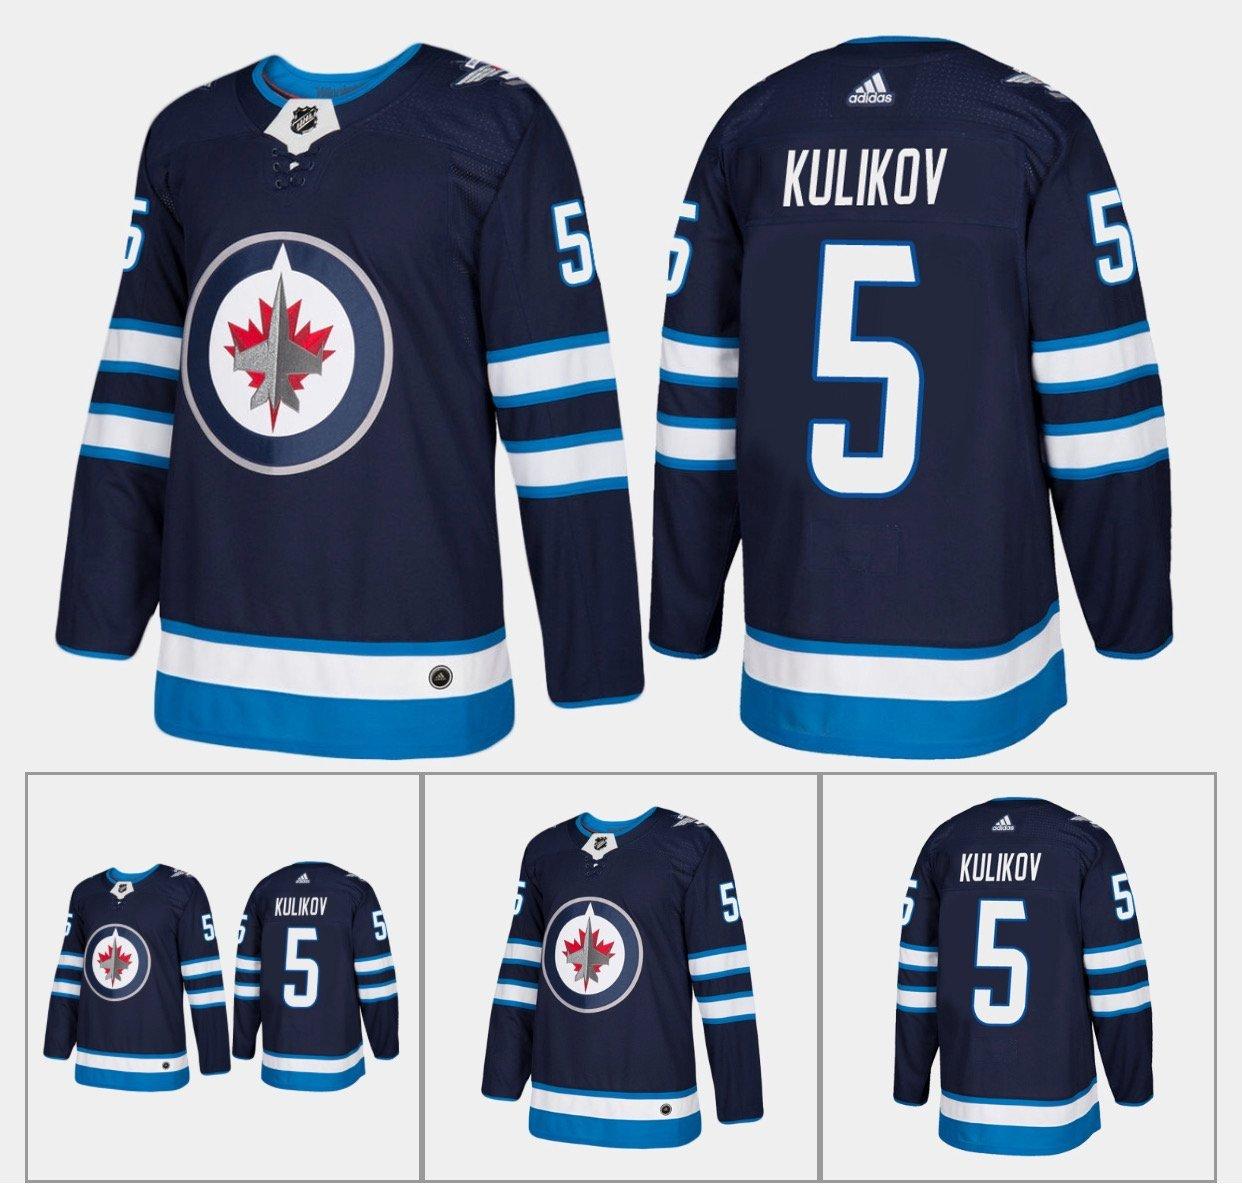 online retailer 33346 cebcf Winnipeg Jets Premier Adidas NHL Home & Road Jerseys ...